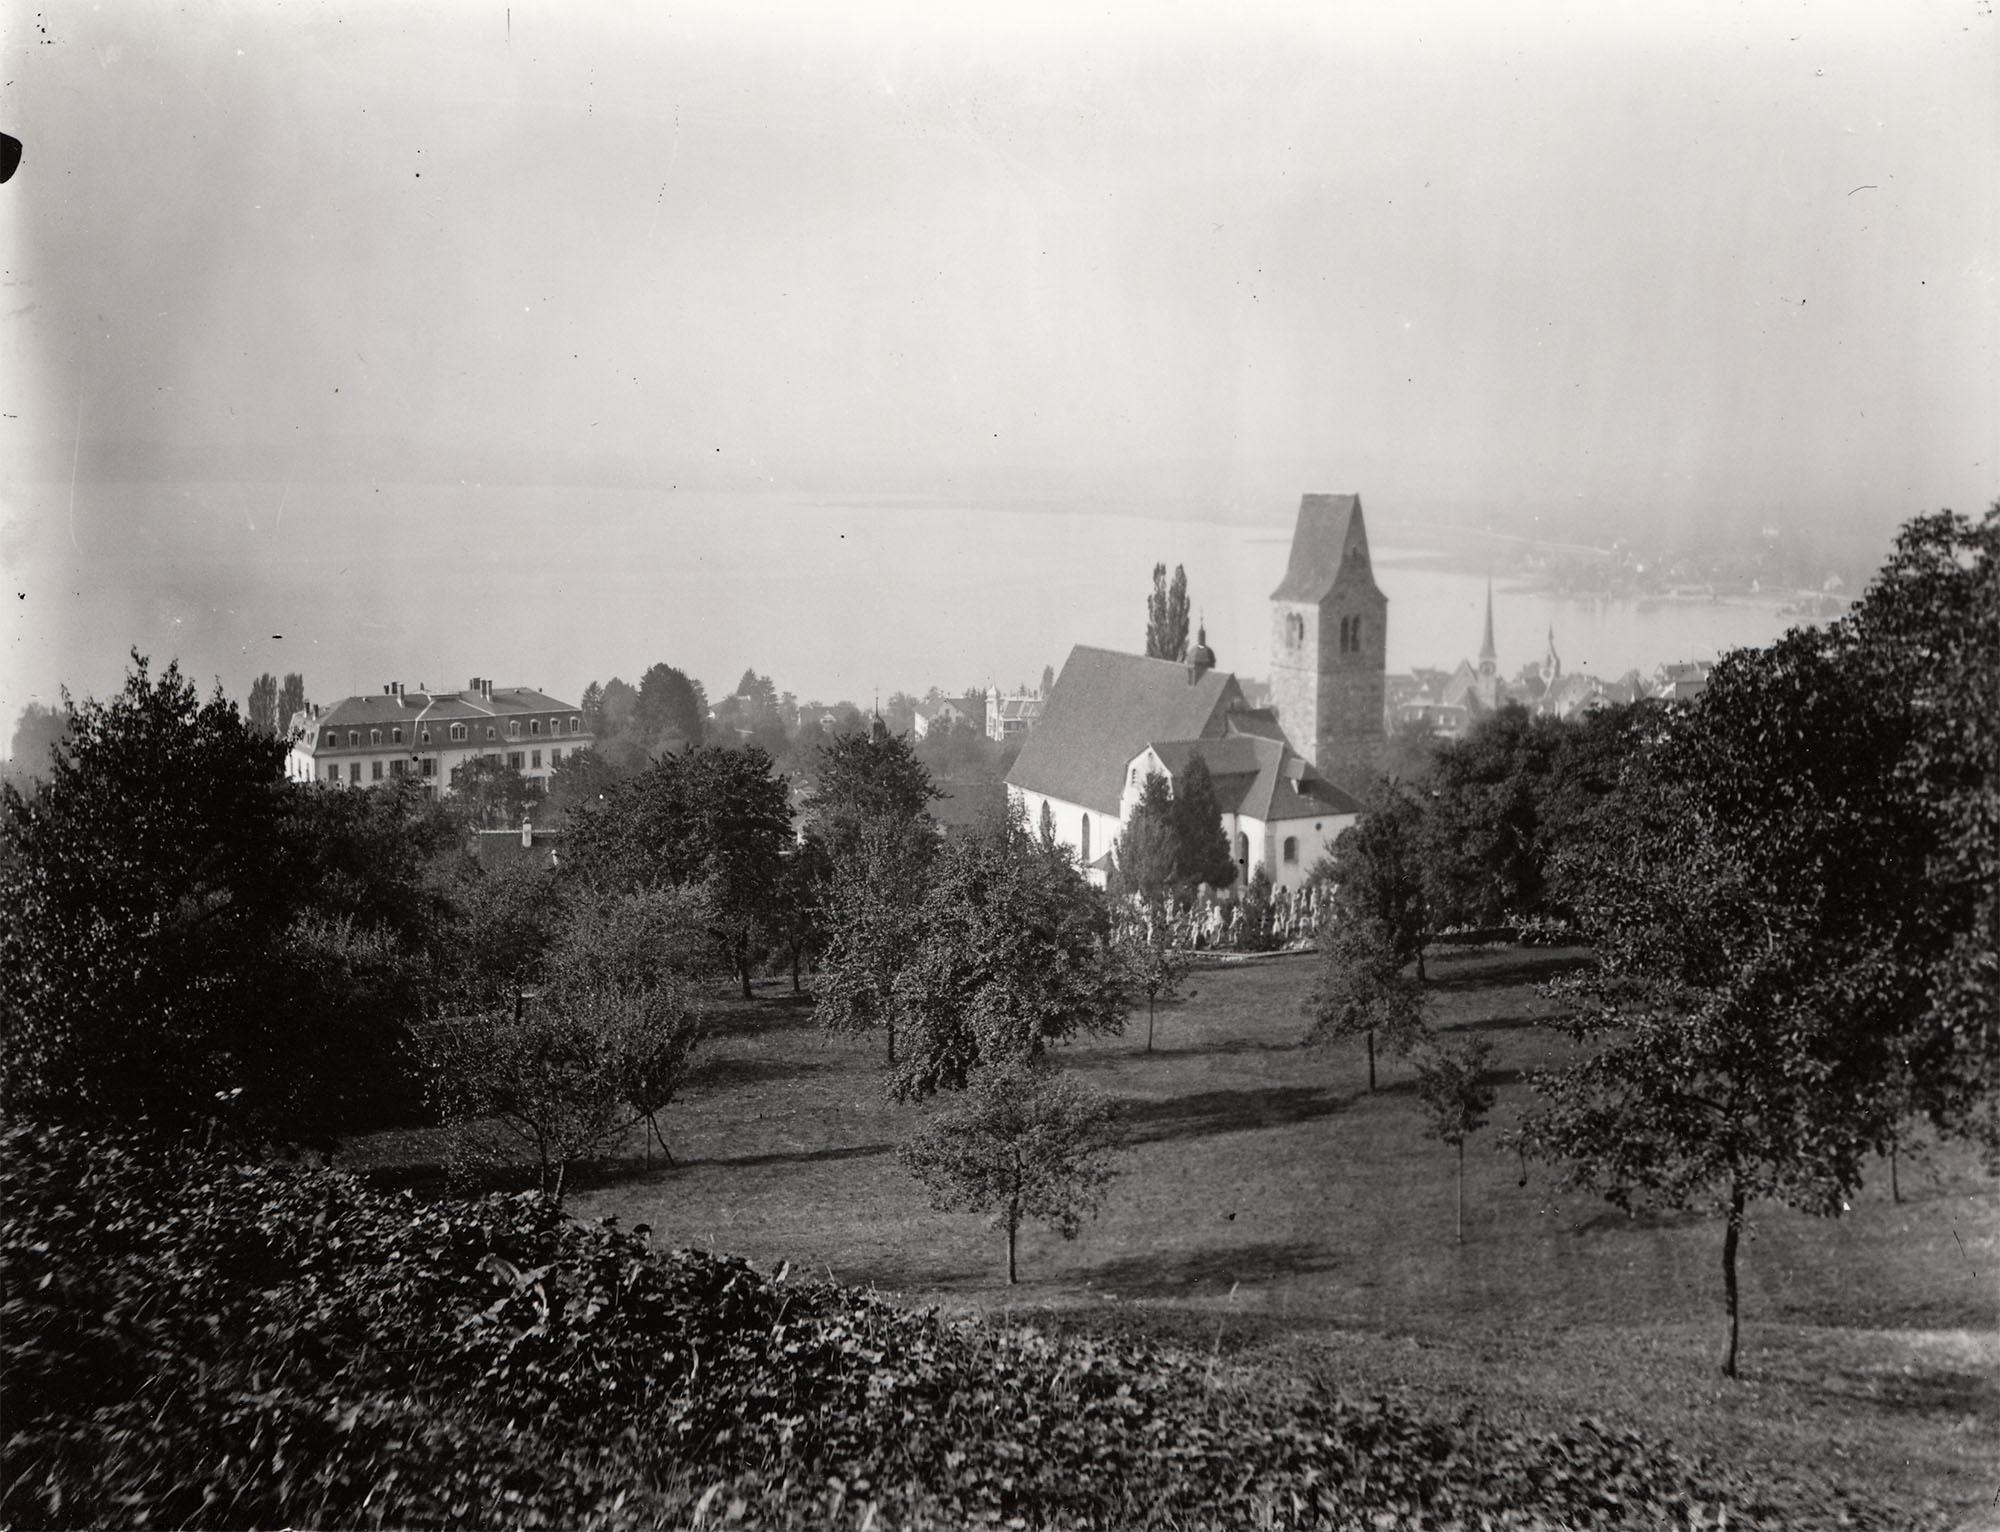 Die alte Kirche St. Michael